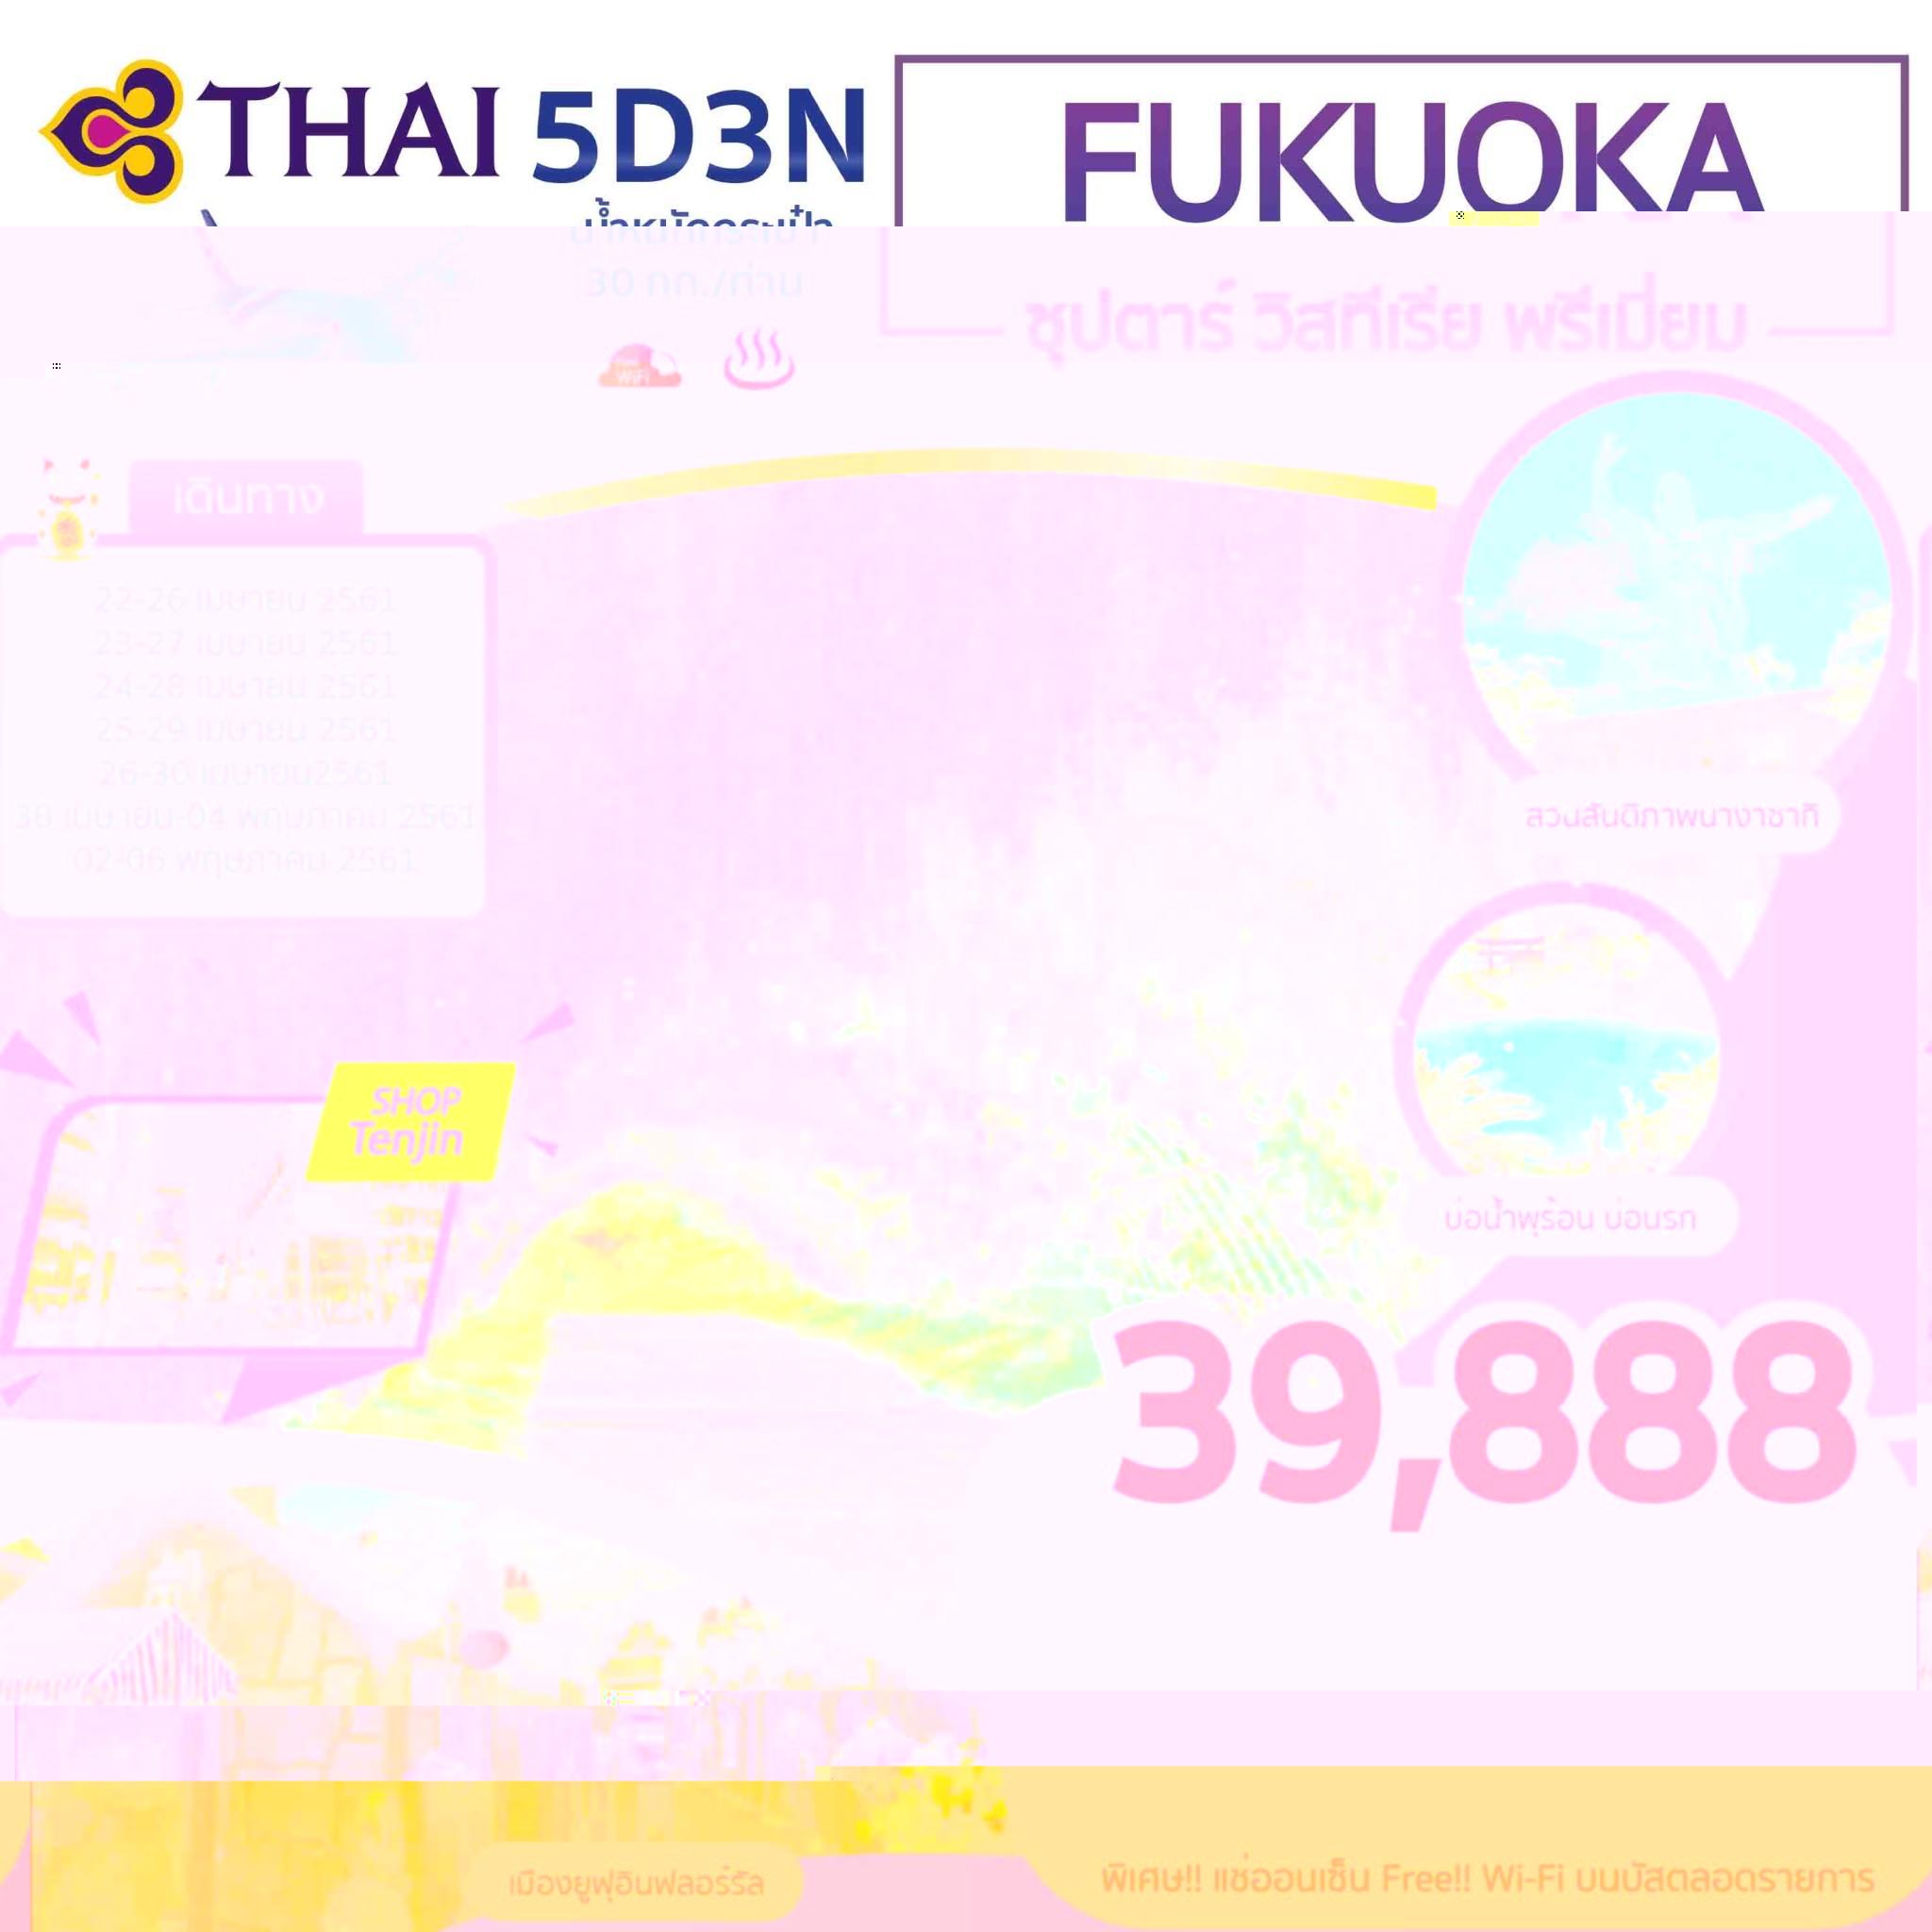 FUKUOKA (ซุปตาร์ วีสทีเรีย พรีเมี่ย)  5D 3N